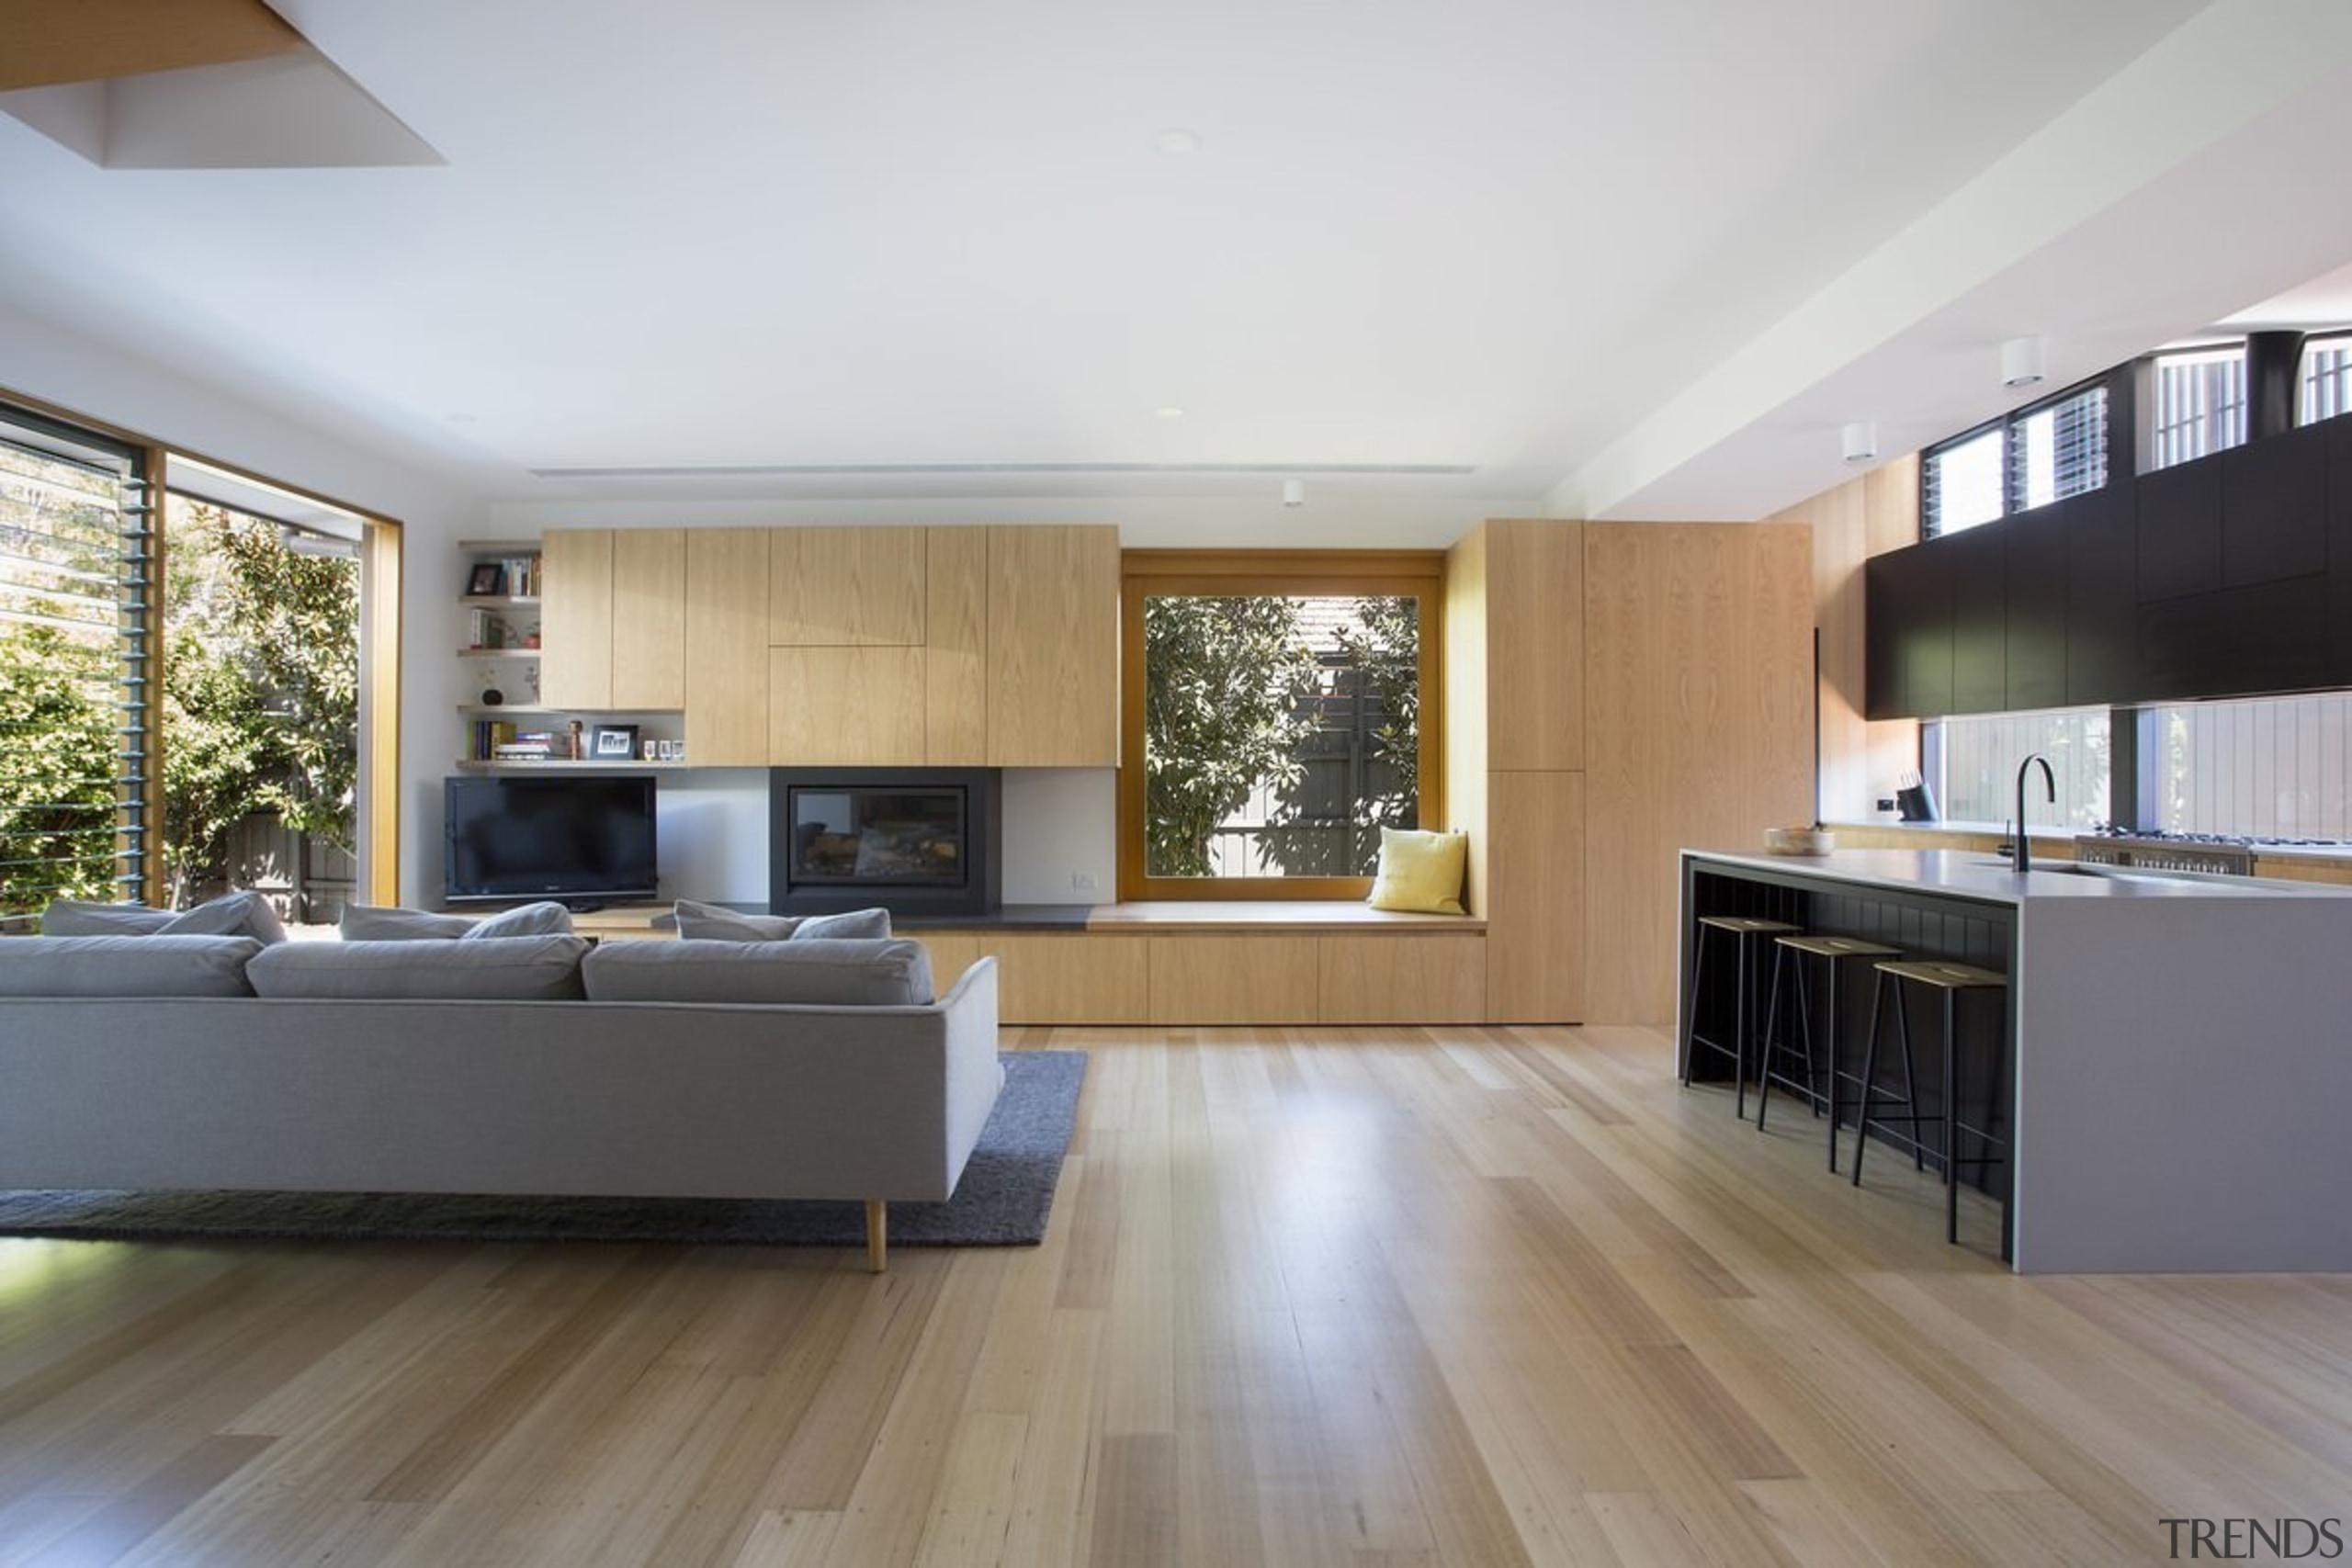 It's an ideal home for entertaining - It's architecture, floor, flooring, hardwood, house, interior design, kitchen, laminate flooring, living room, room, wood, wood flooring, gray